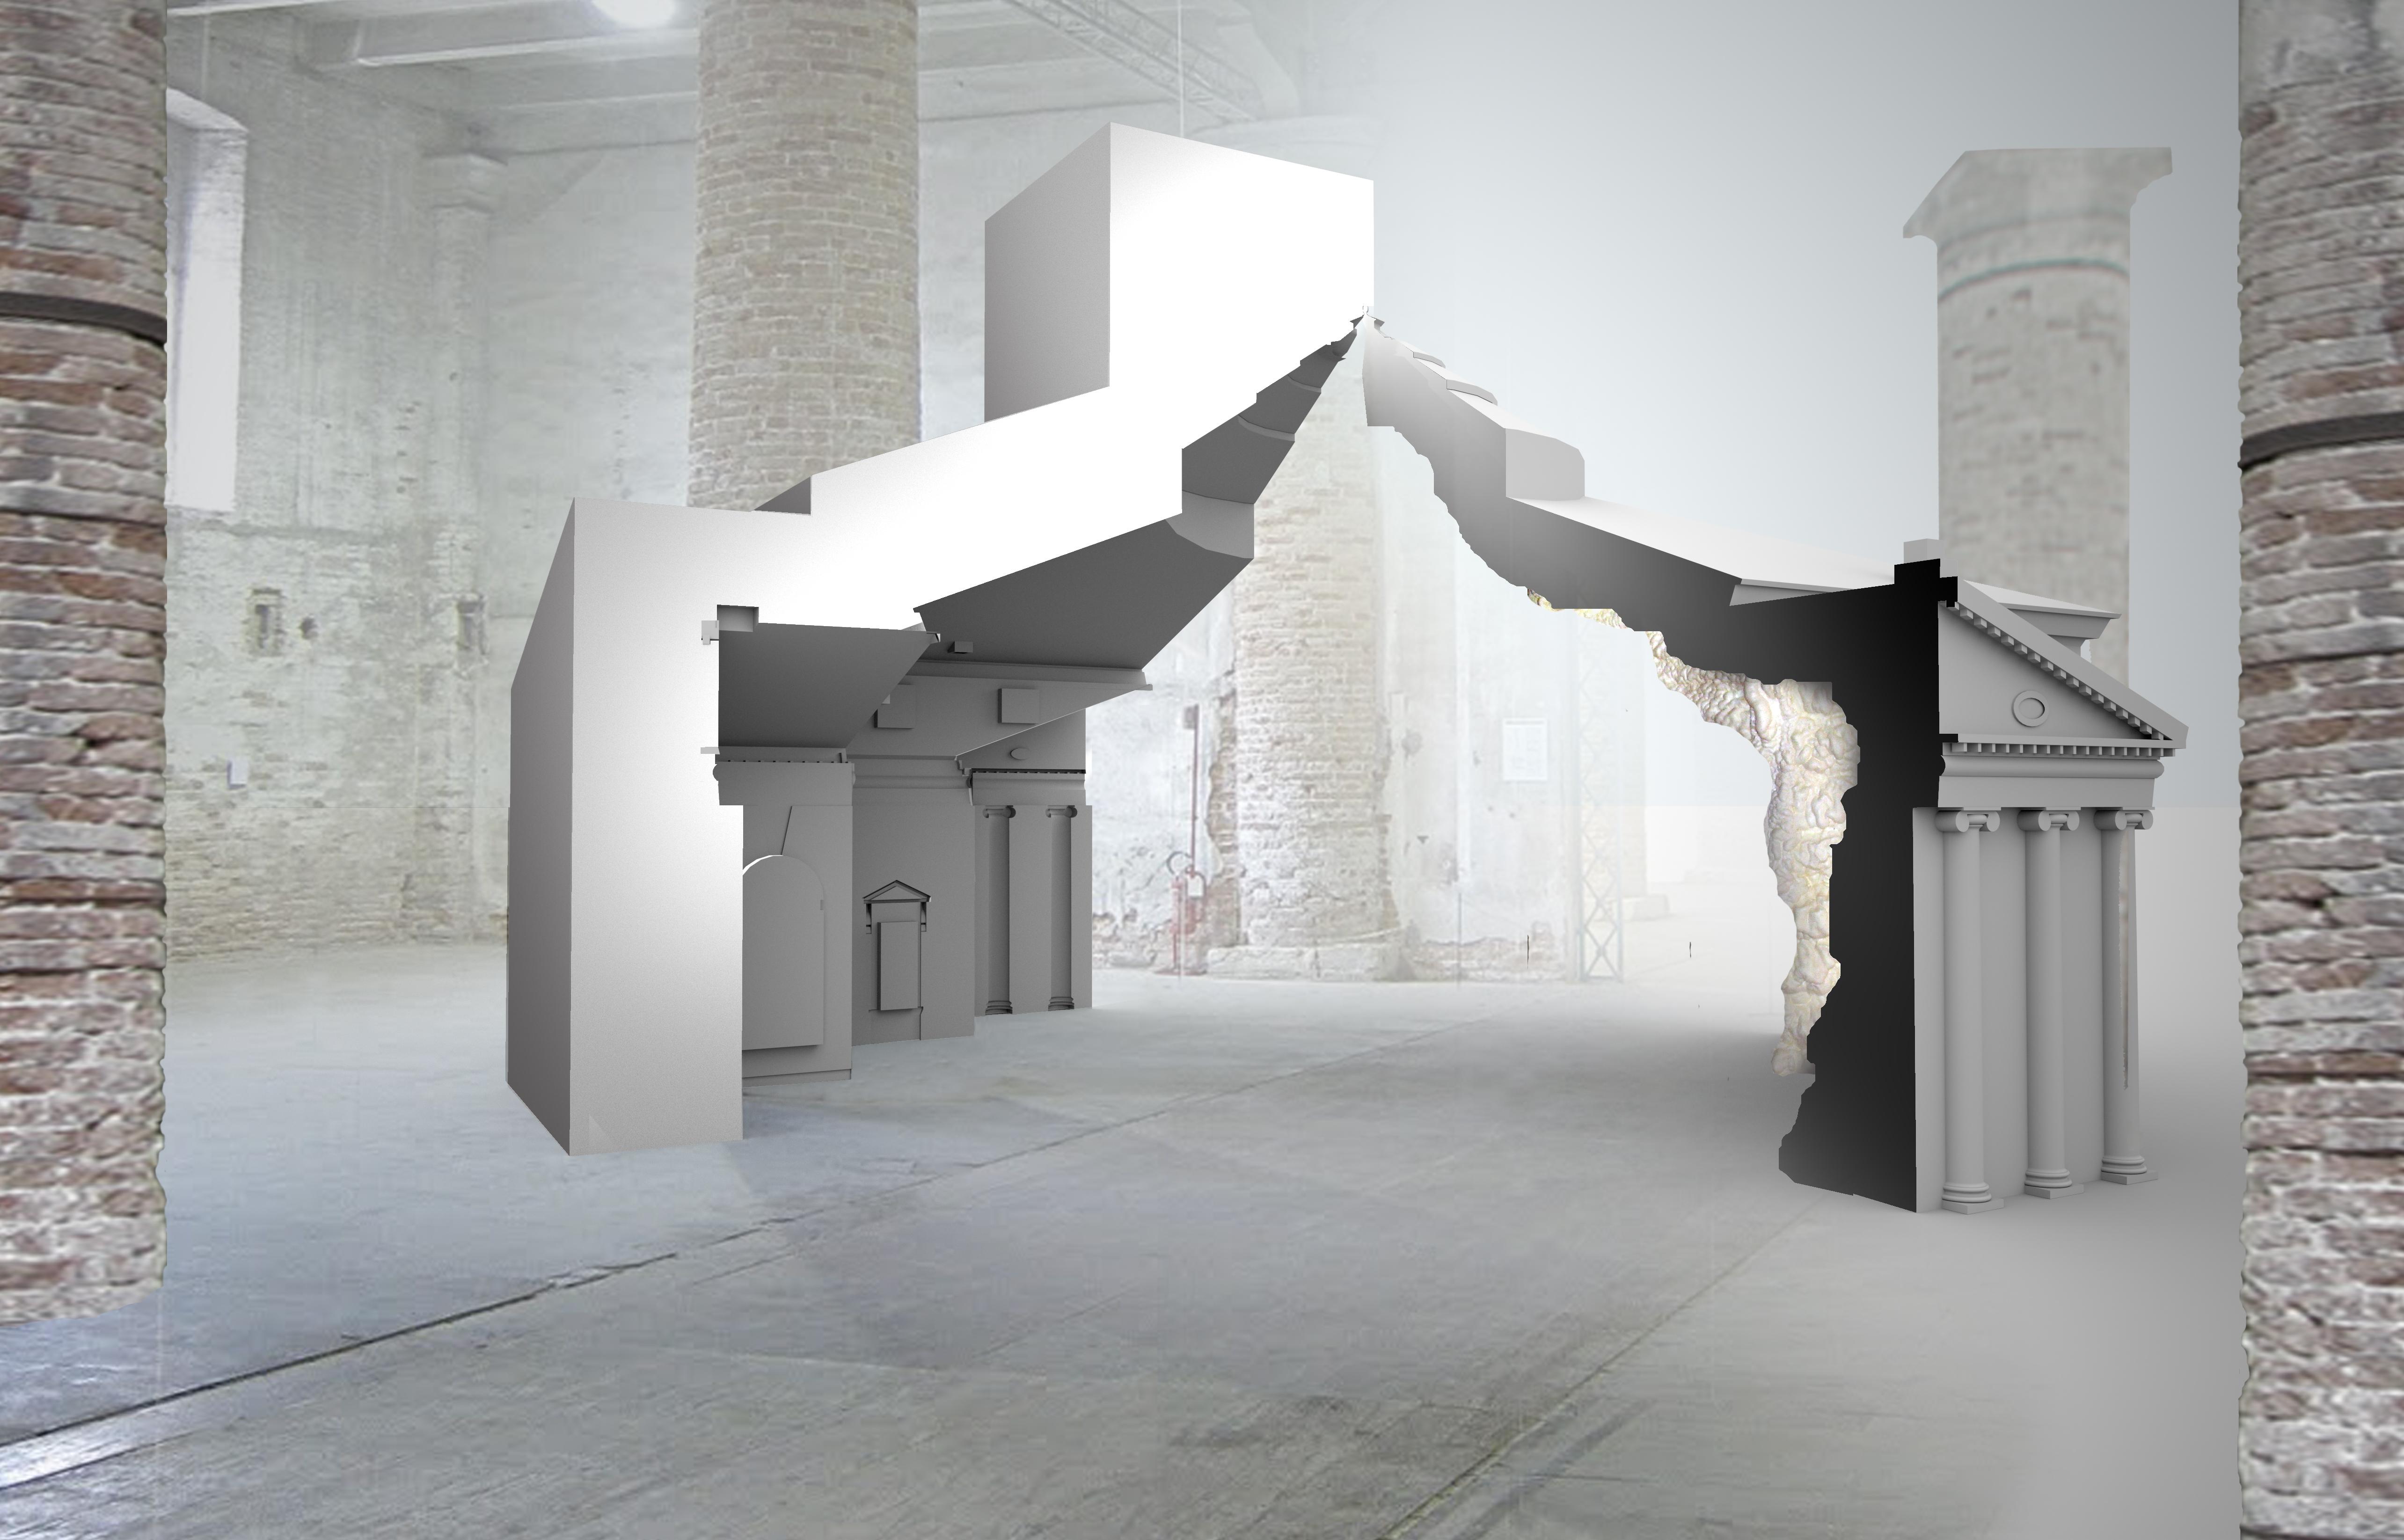 Bienal de Veneza 2012: FAT apresenta 'O Museu da Cópia', Cortesia de FAT